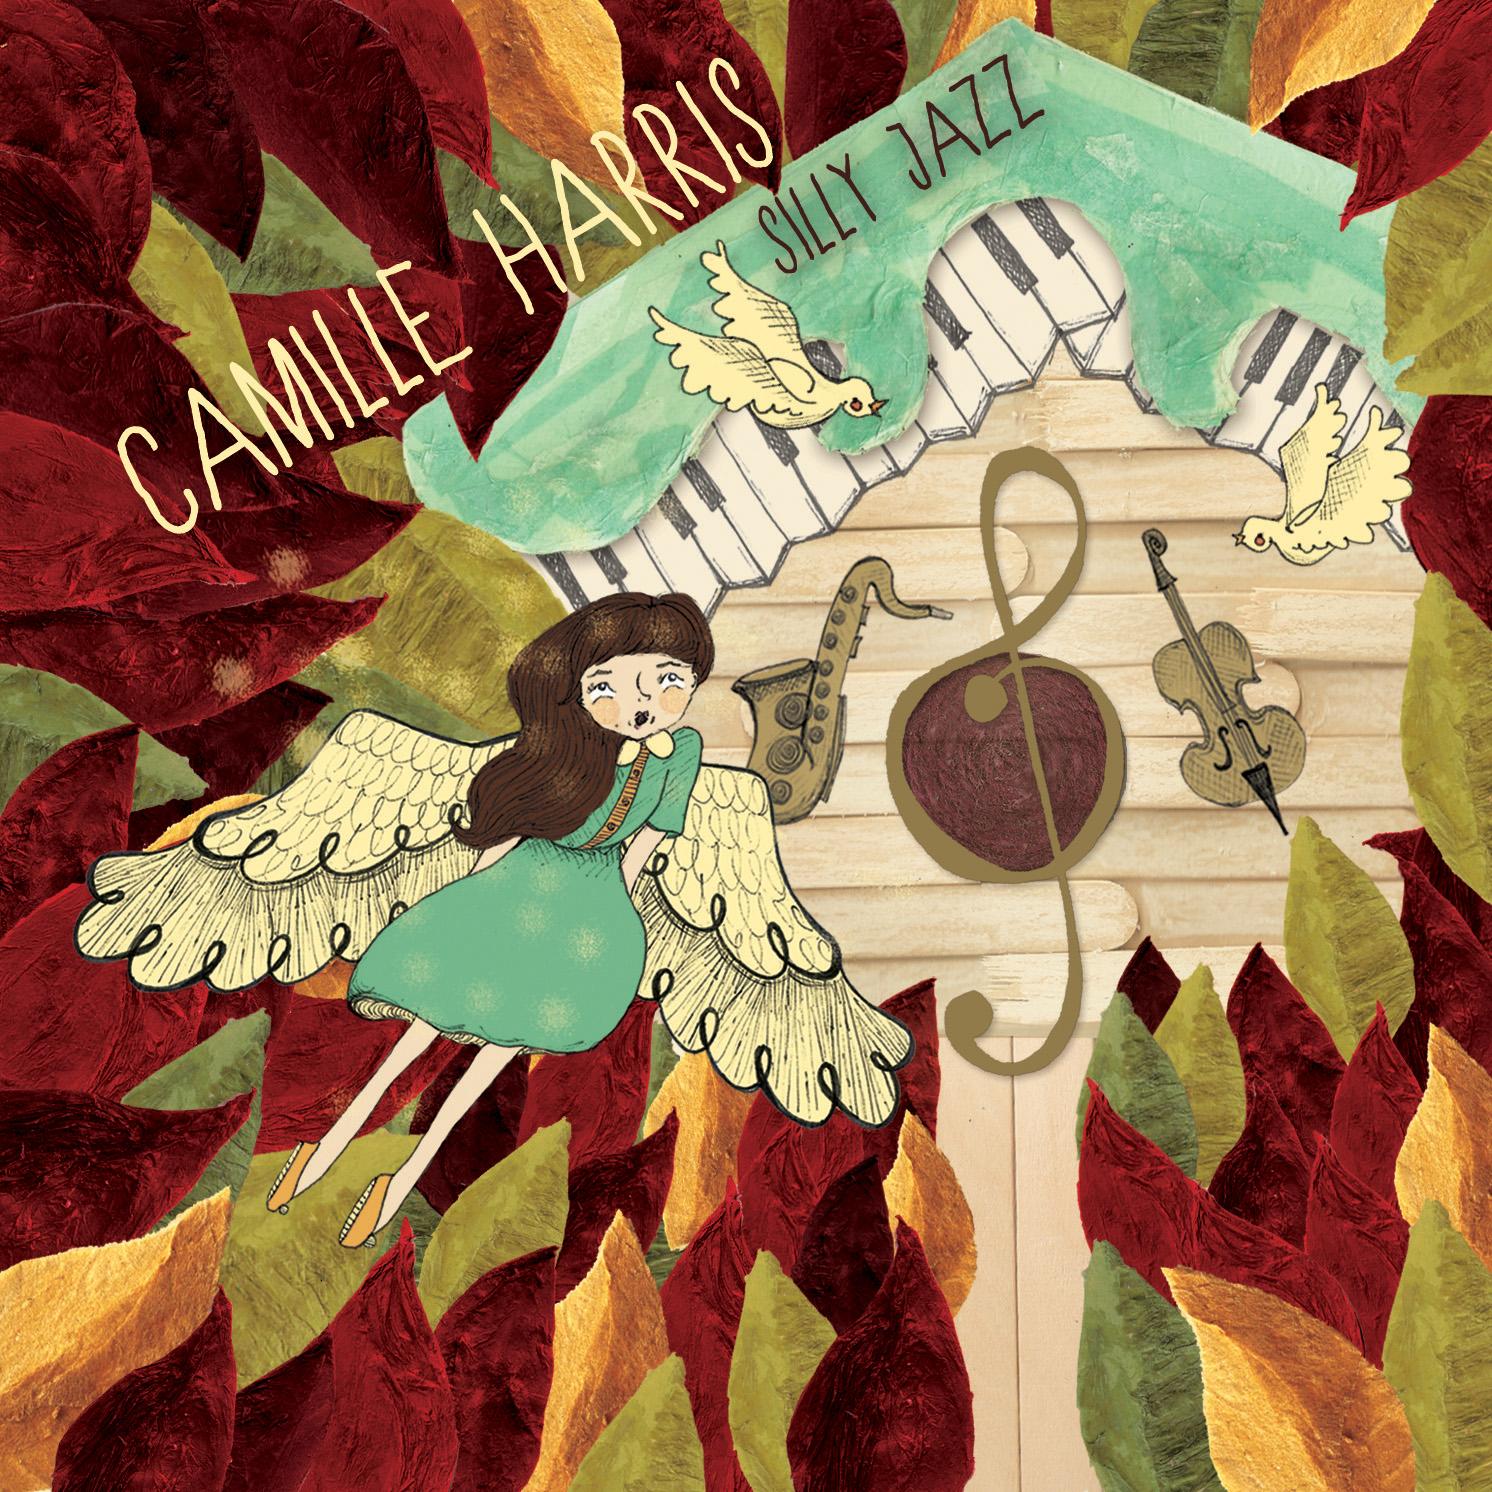 Camille CD_Silly Jazz rgb.jpg